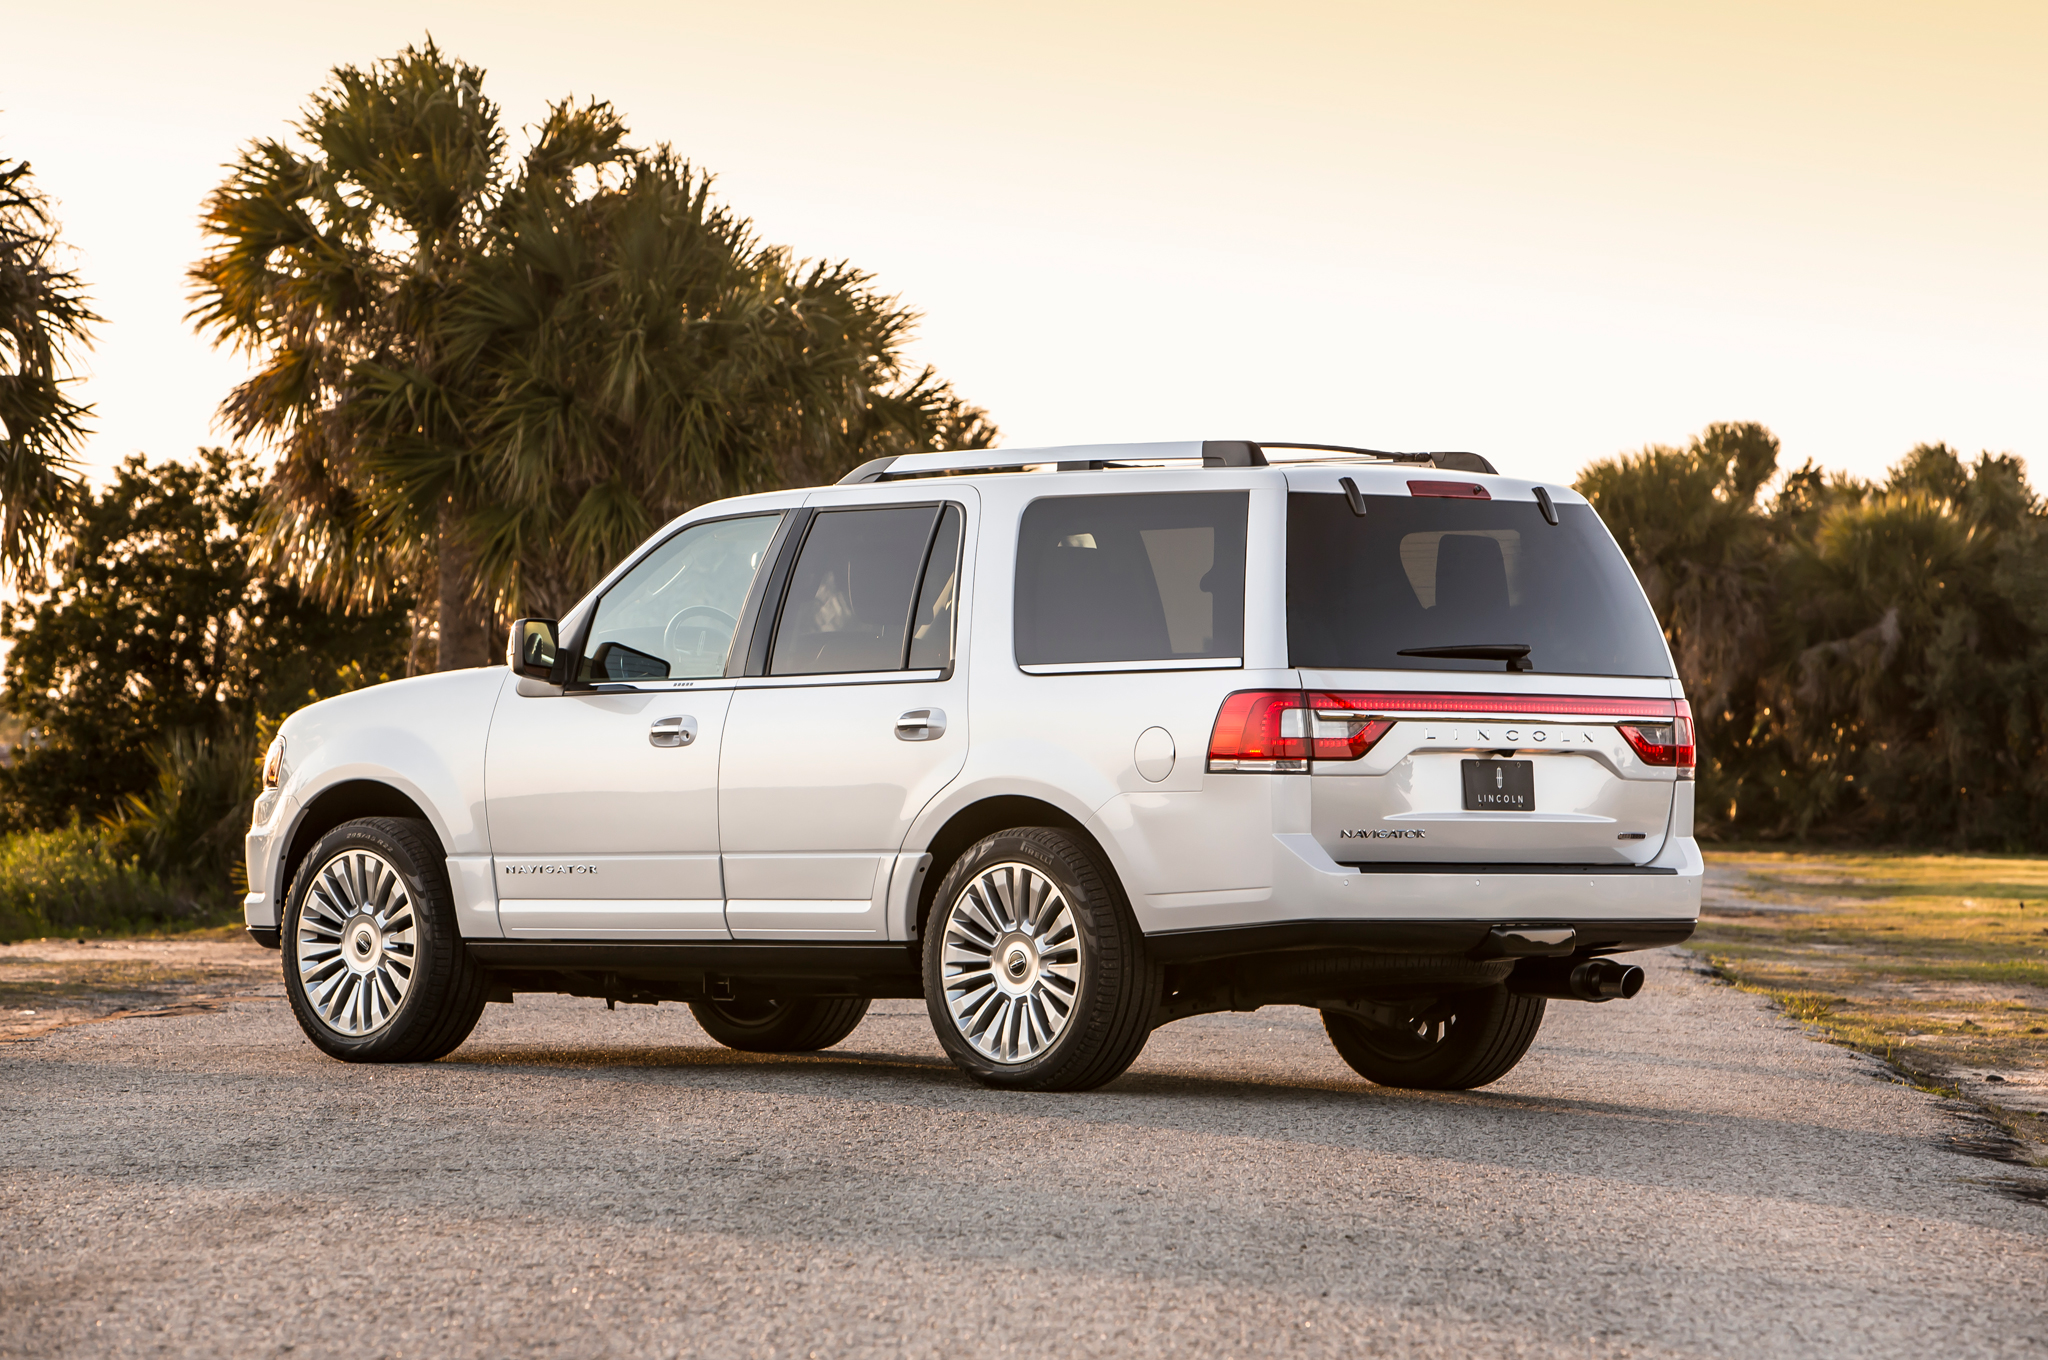 2015 Lincoln Navigator Rear Side Posing